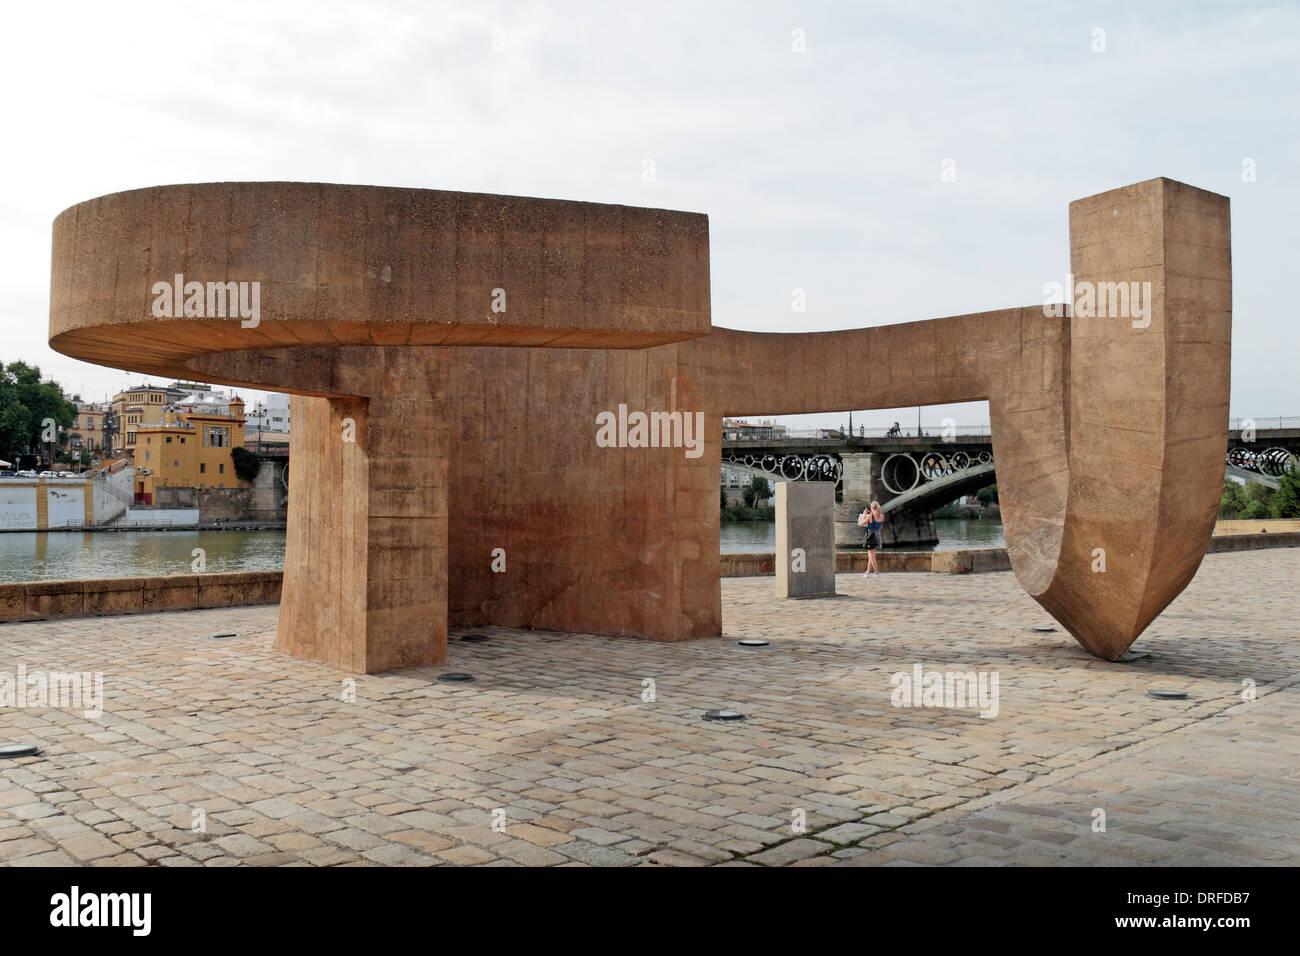 La Tolerancia sculpture or 'Monument to Tolerance',  Muelle de la Sal, Seville (Sevilla), Andalusia, Spain. - Stock Image